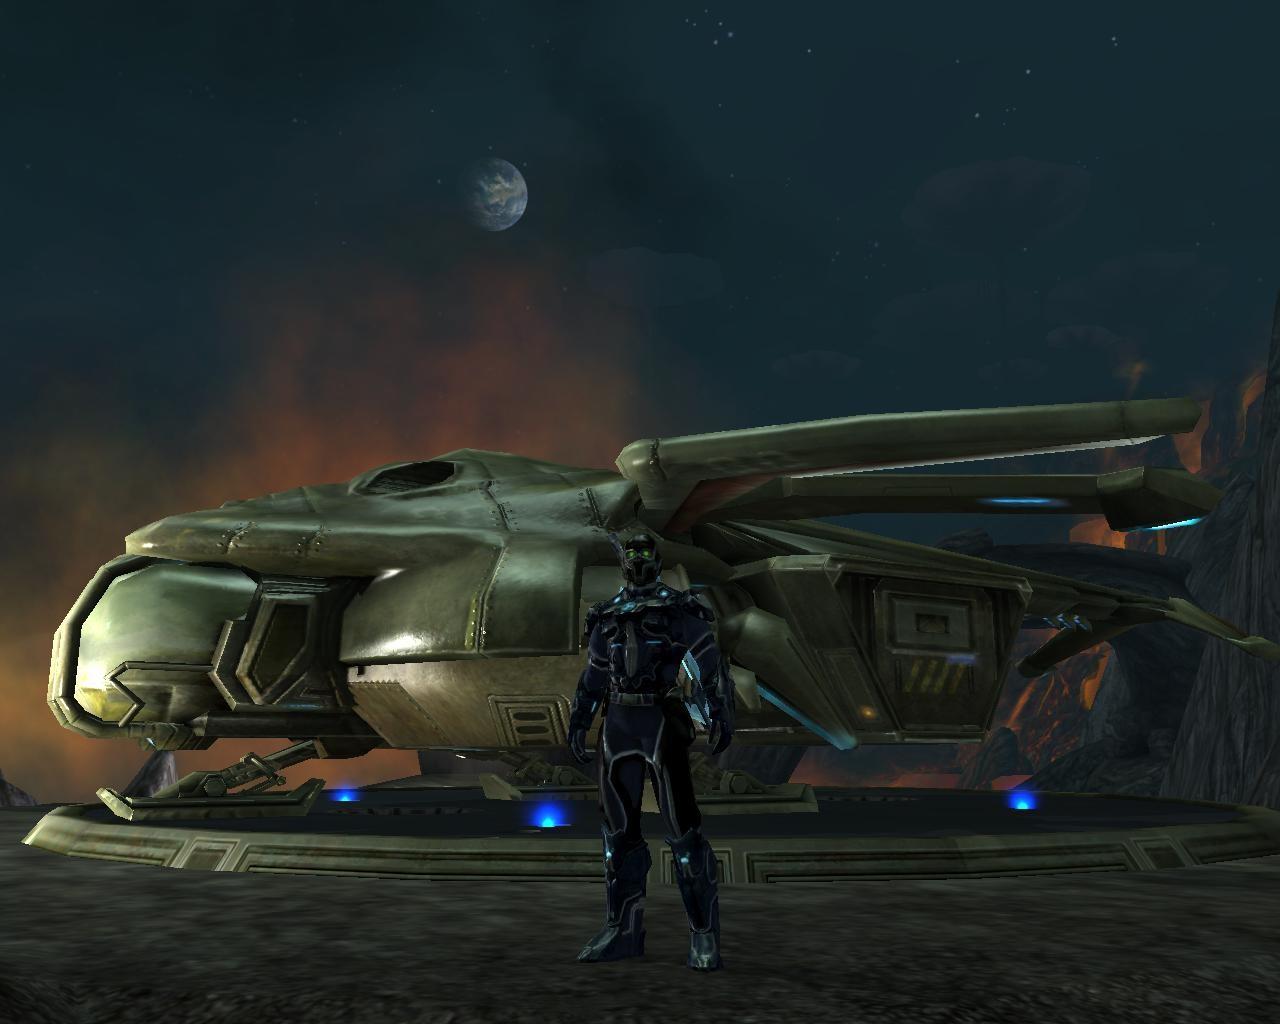 Spy with dropship  - MMORPG com Tabula Rasa Galleries